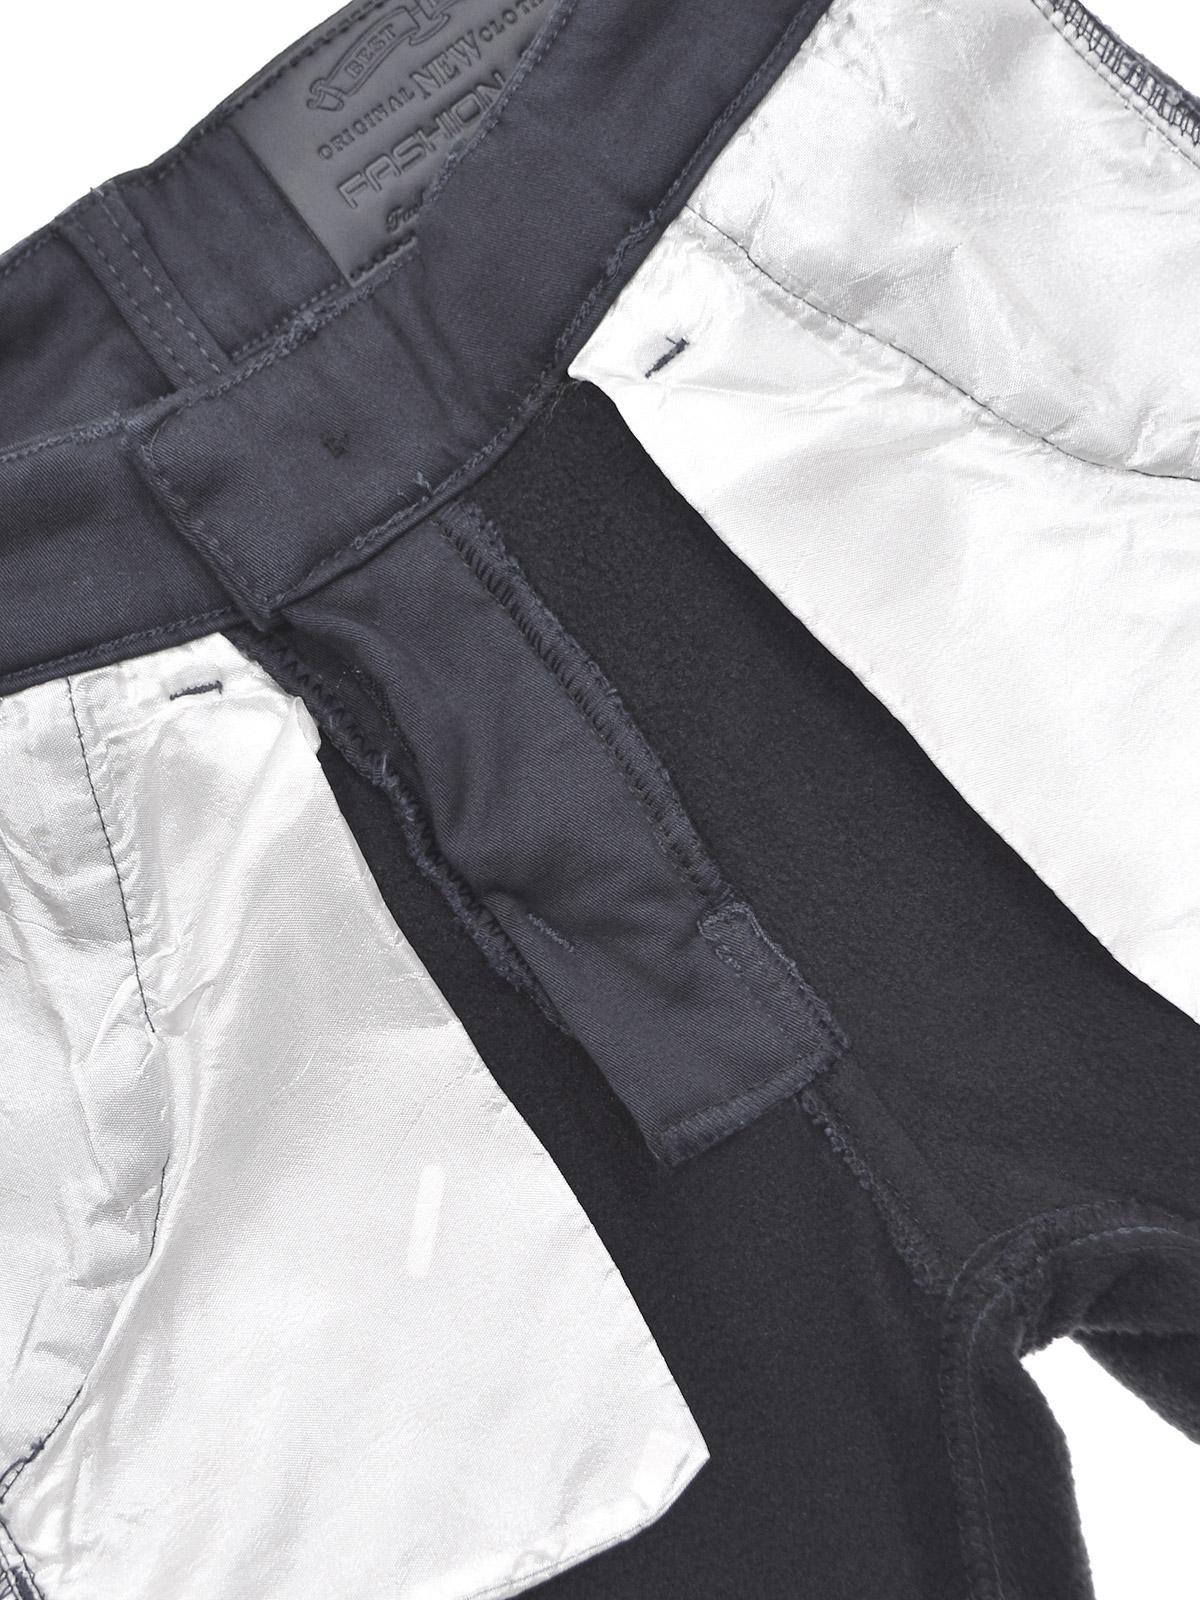 Enfants-Chino-THERMO-d-039-hiver-Pantalons-Garcons-Pantalon-Doublure-Stretch-Reglable-22904 miniature 11